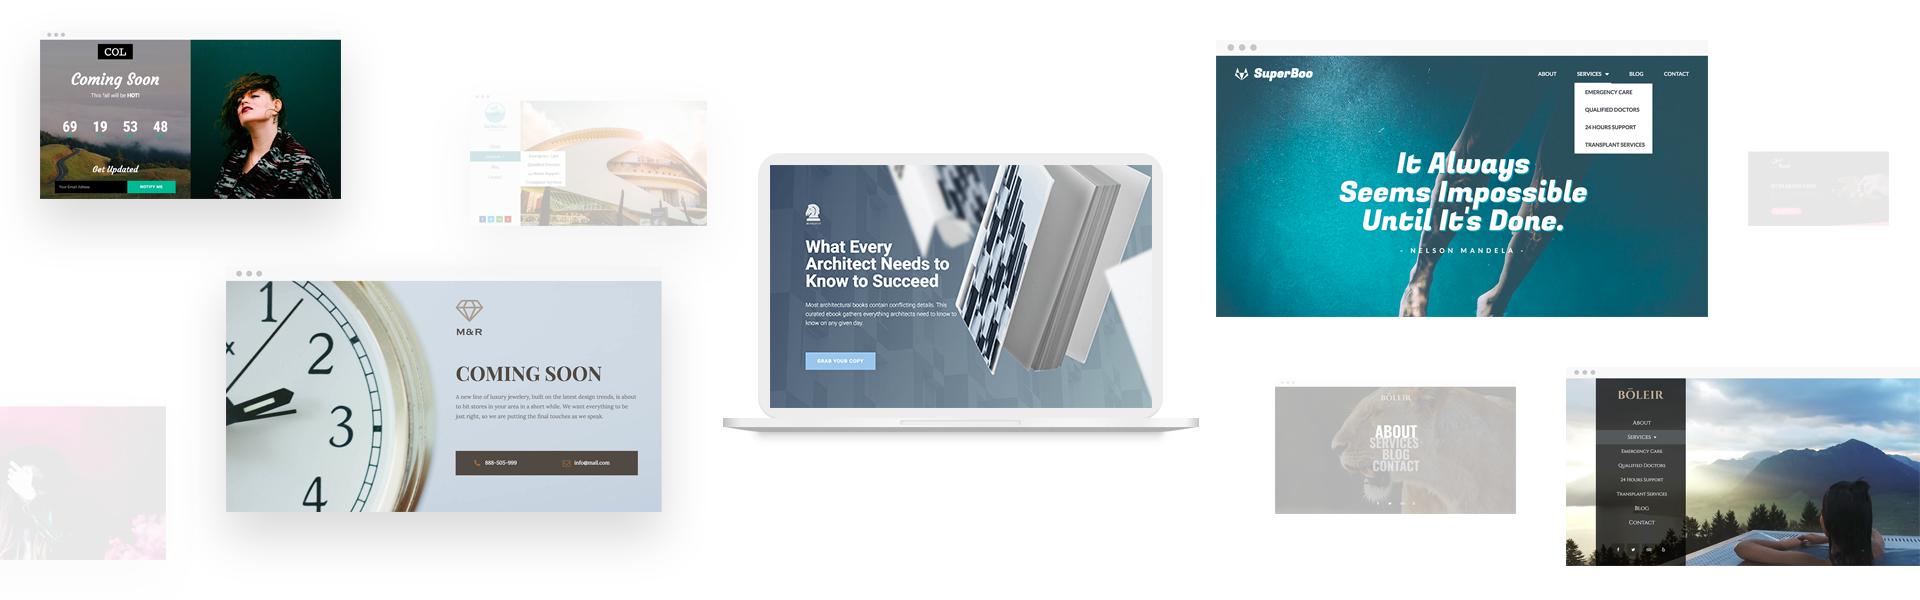 eLearning für behörden, elearning software.